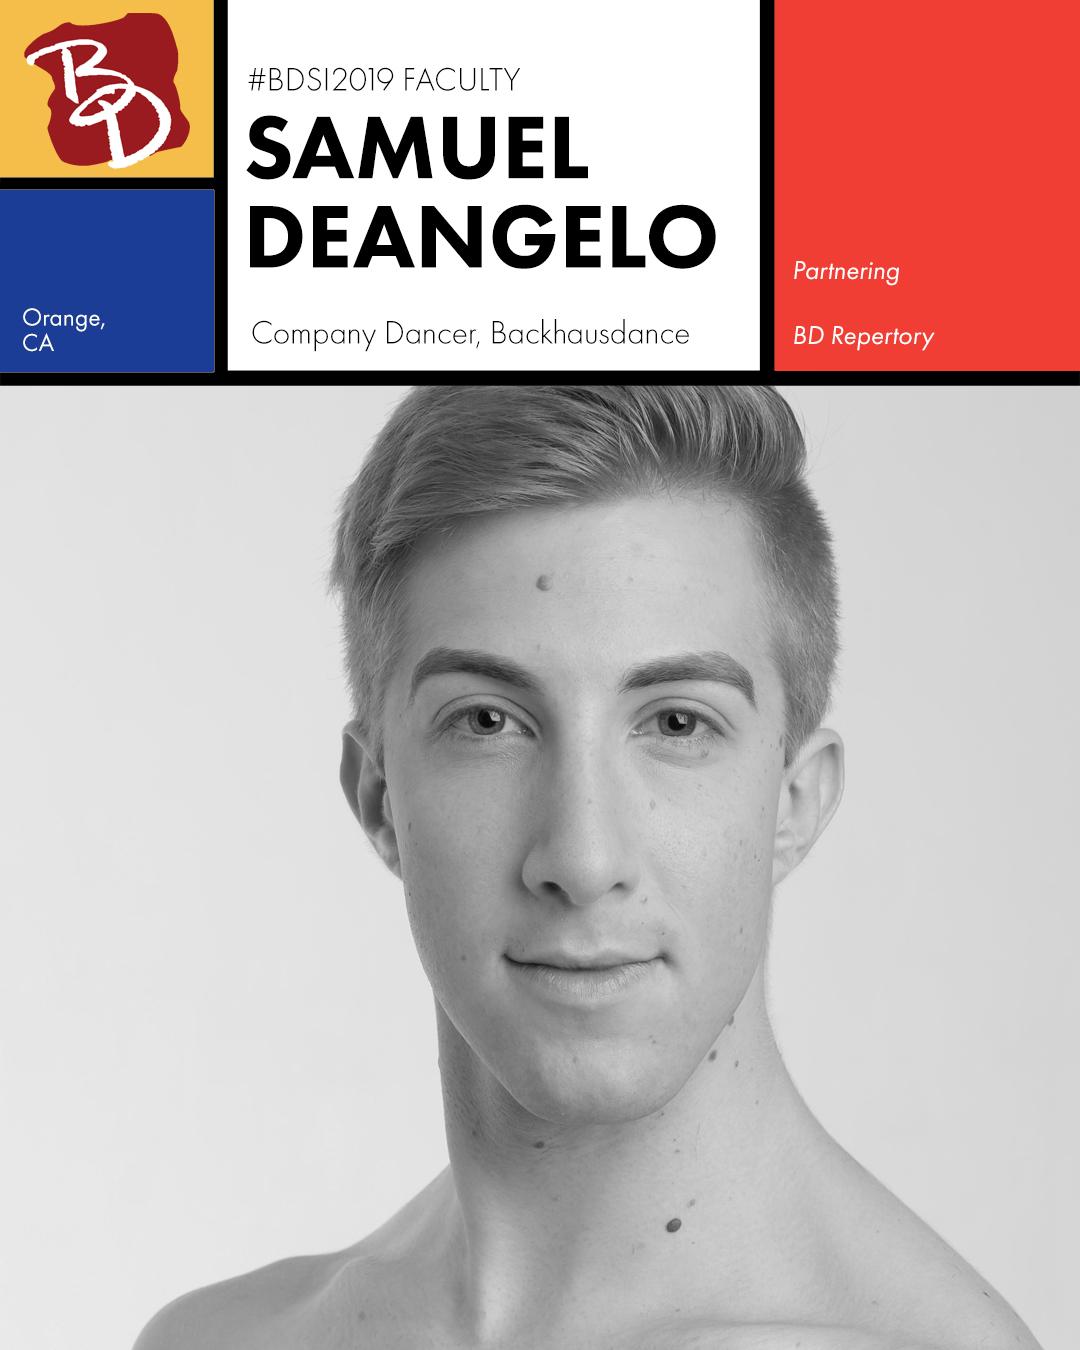 Faculty Announcement - DeAngelo Samuel.jpg